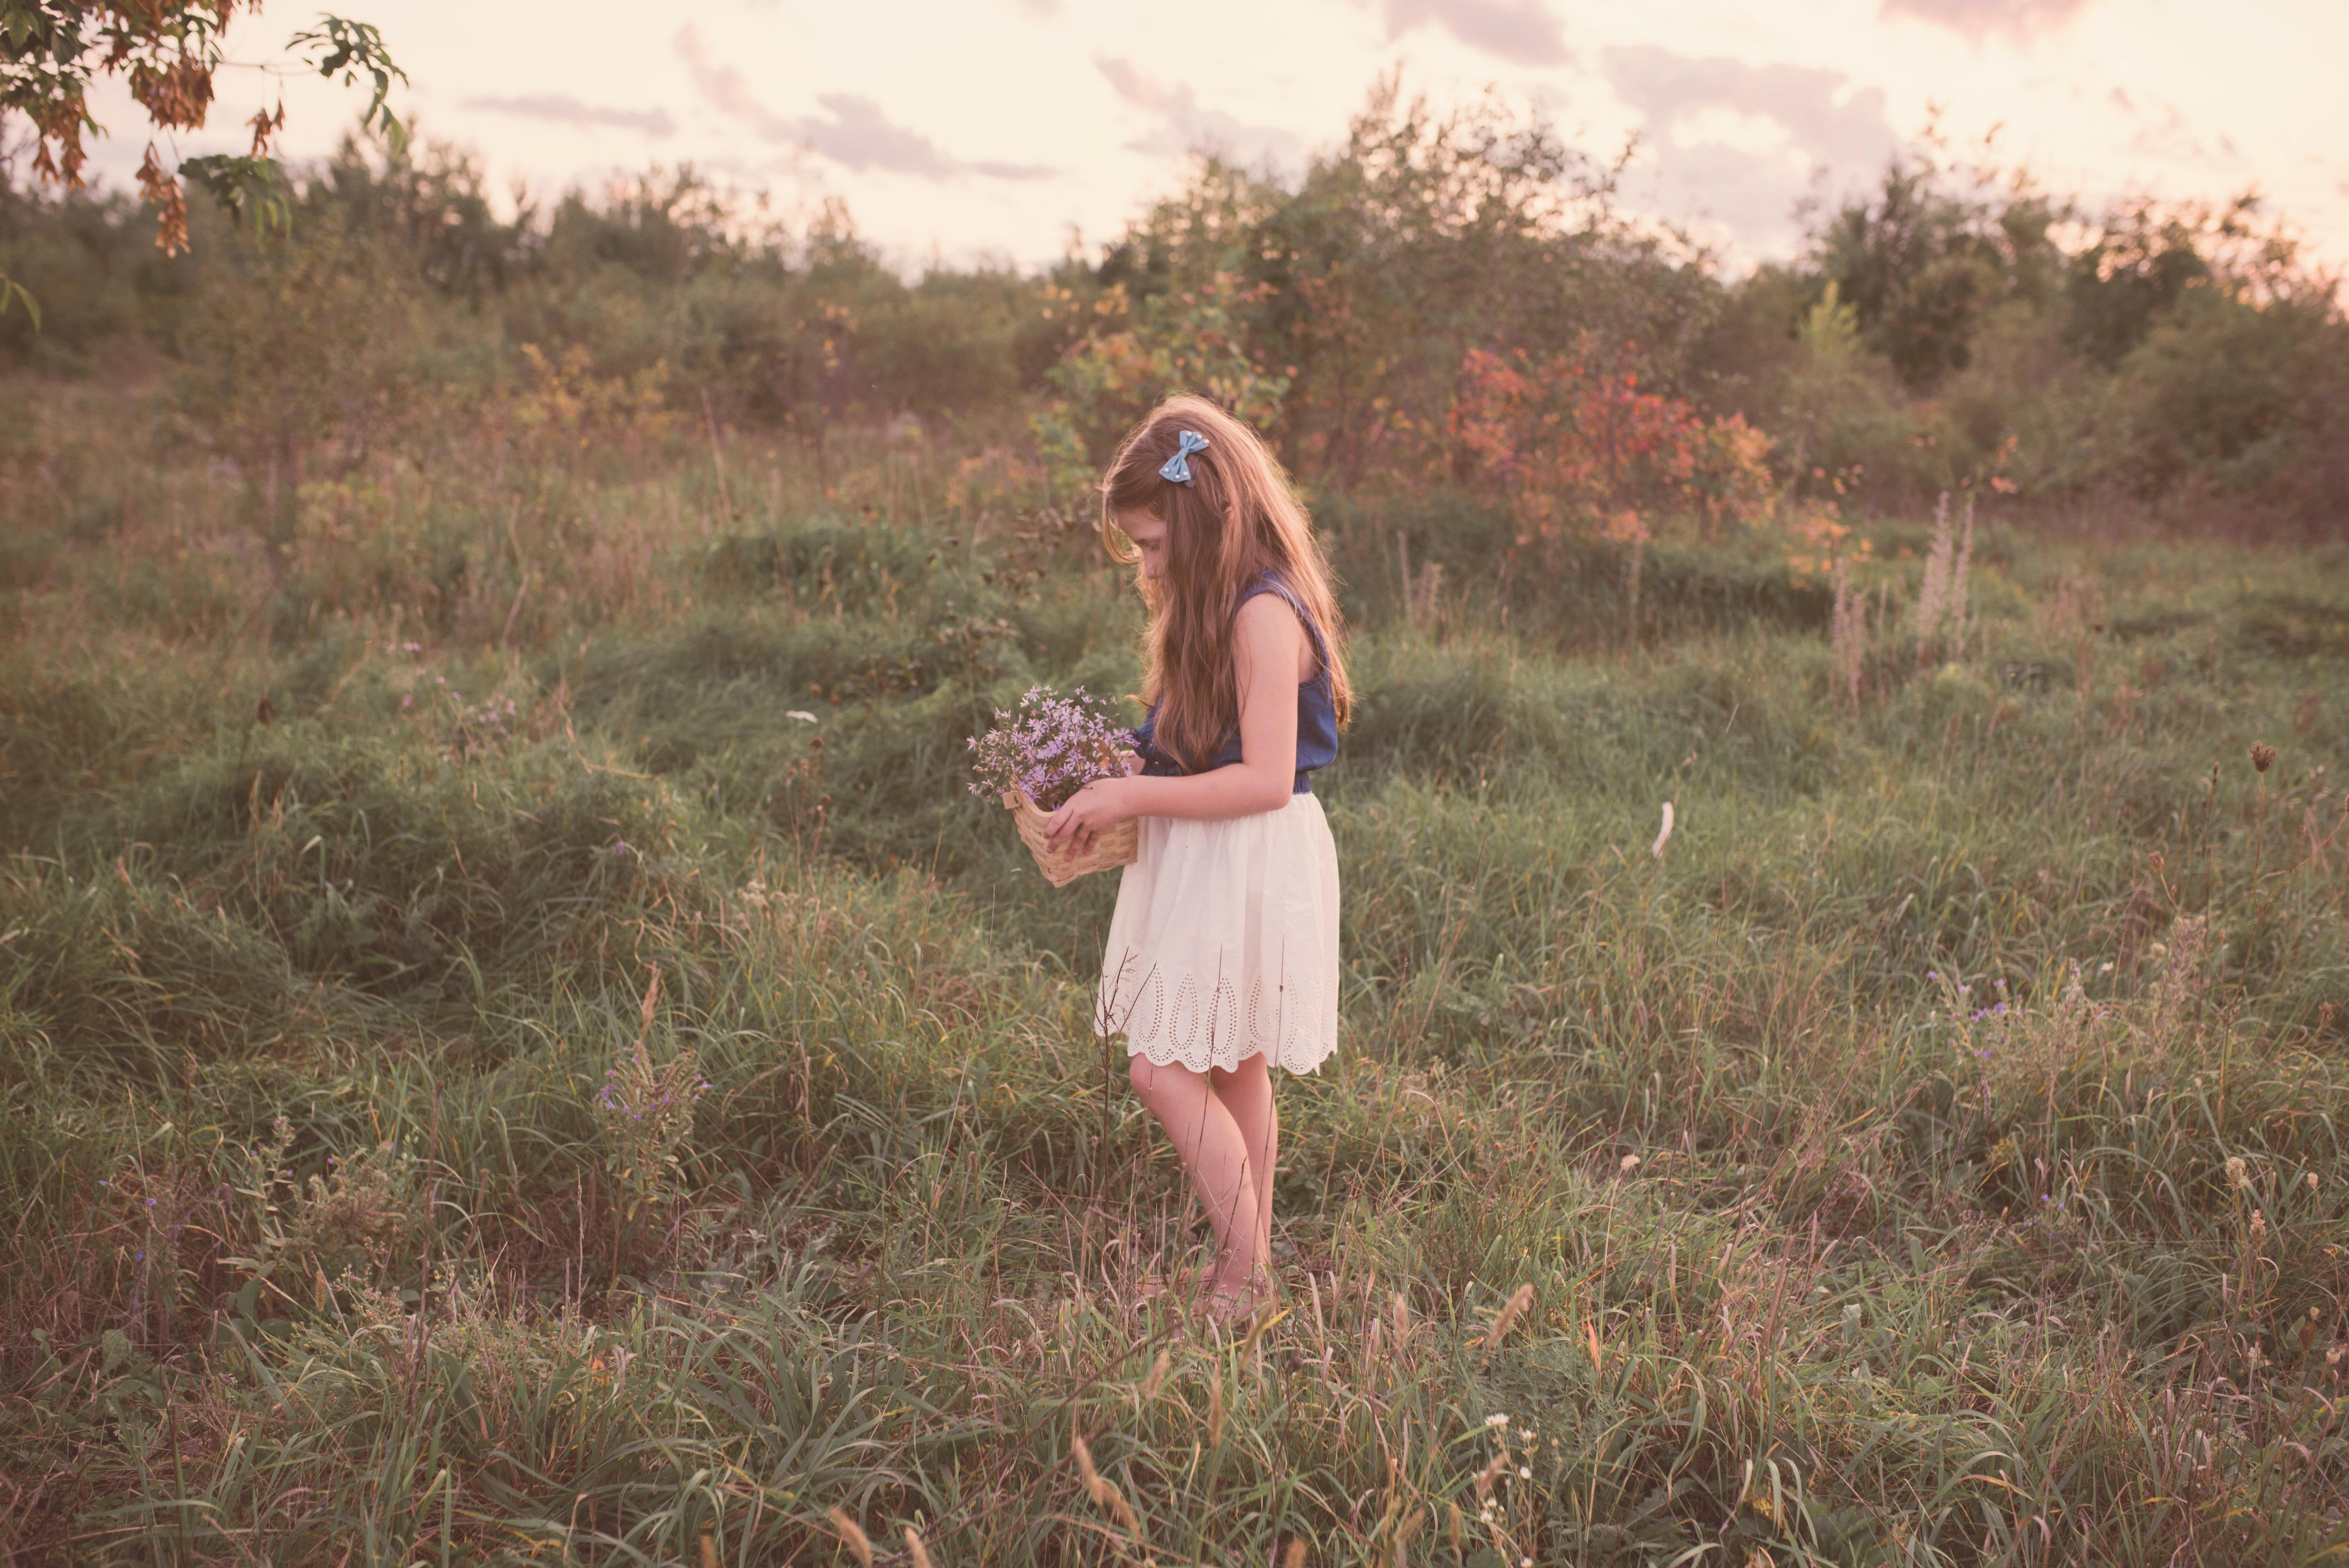 girl holding basket of flower standing on grass field